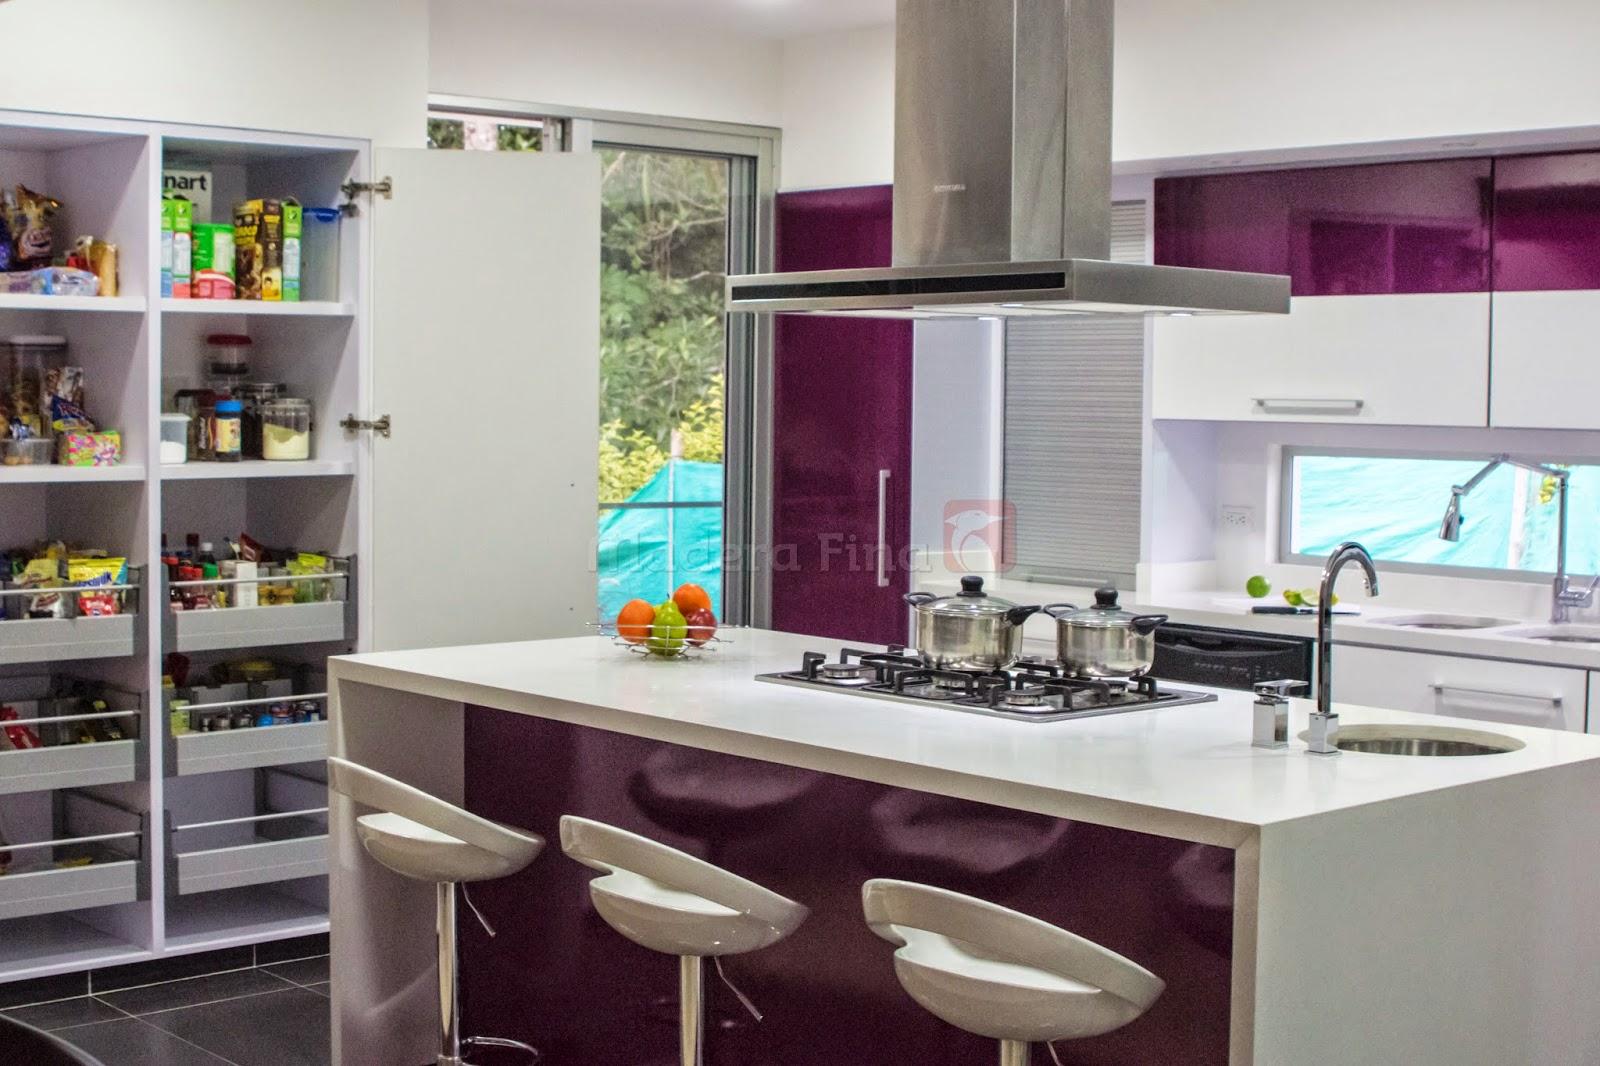 Cocina moderna en pereira morado y blanco cocinas for Marmol color morado